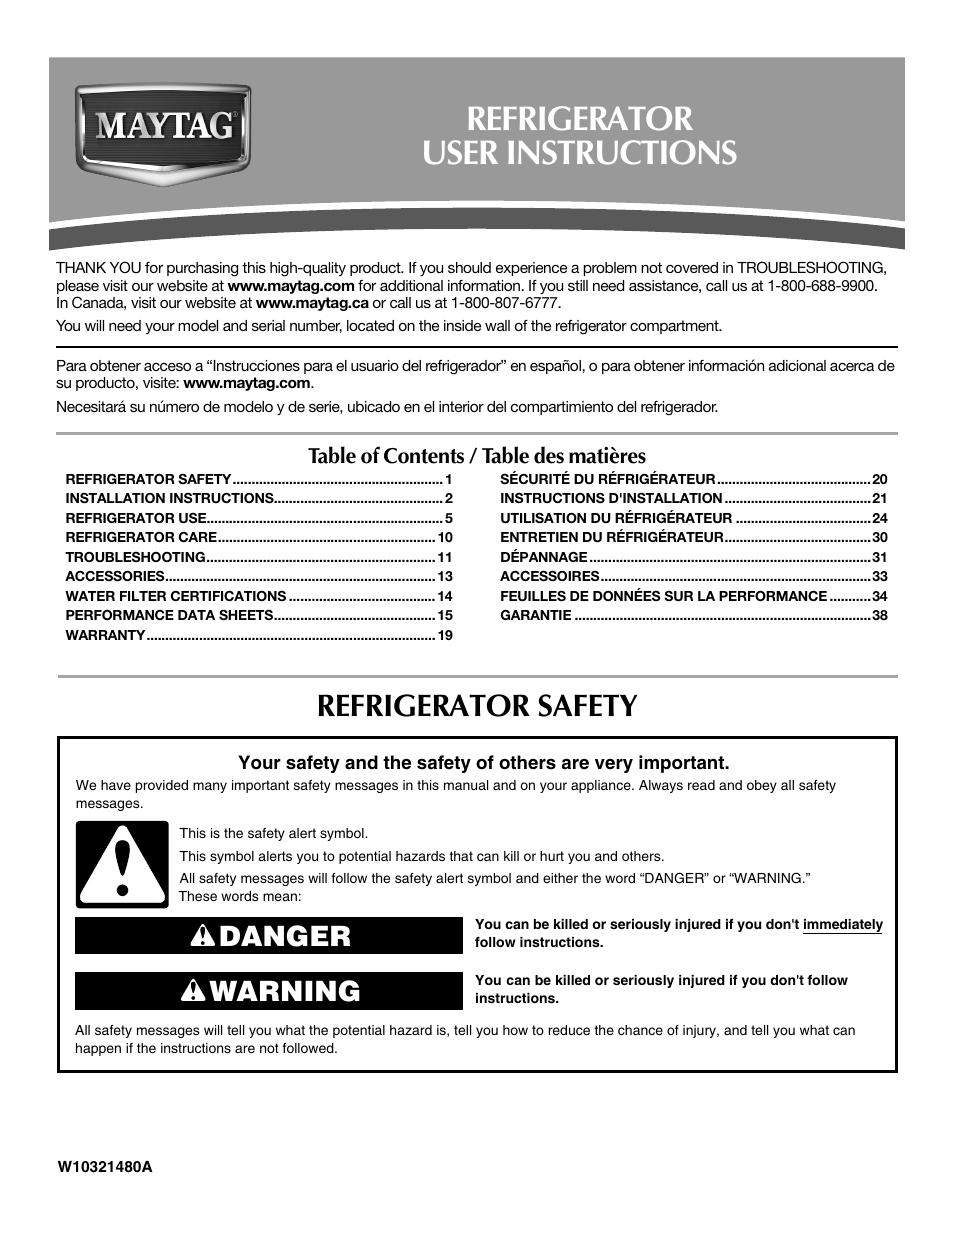 maytag installation manual